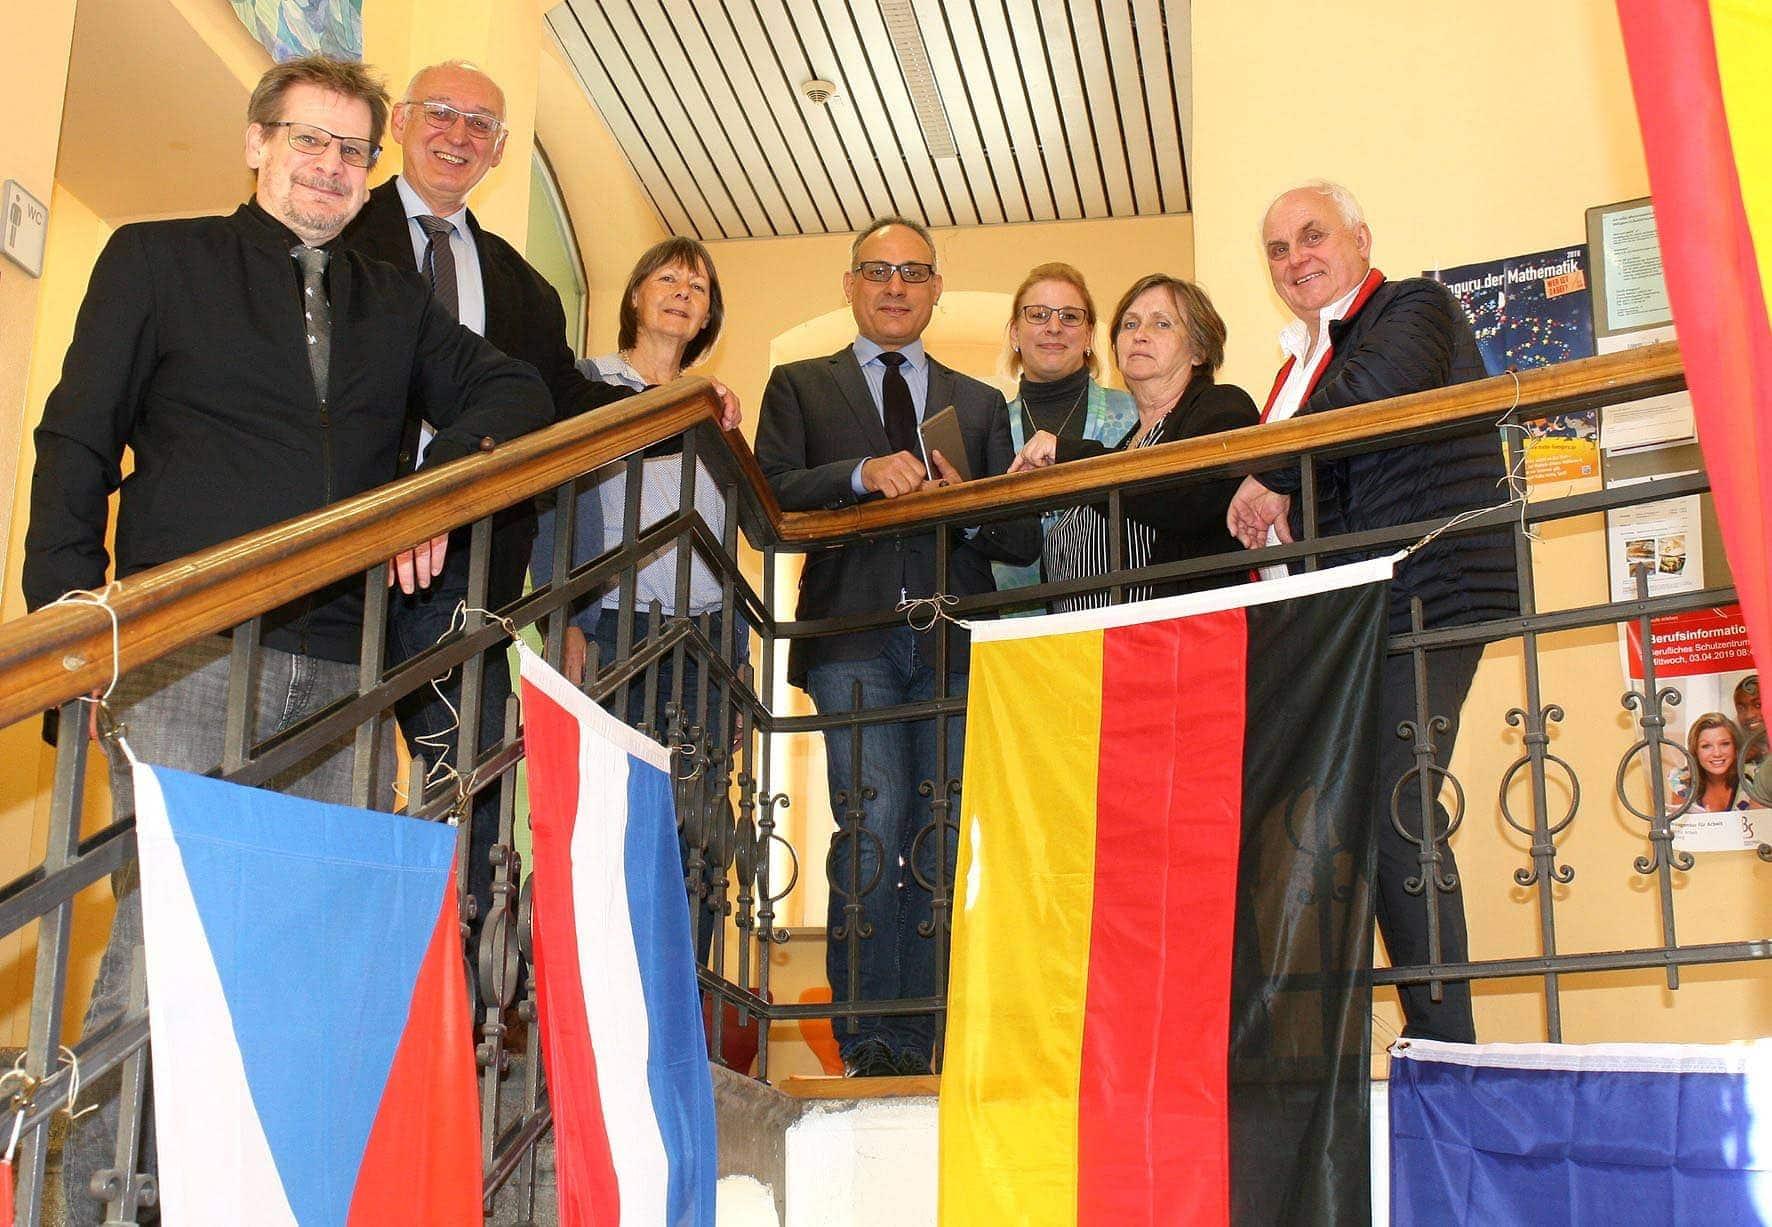 Europa-Abgeordneter Ertug bei den Privaten Schulen Breitschaft